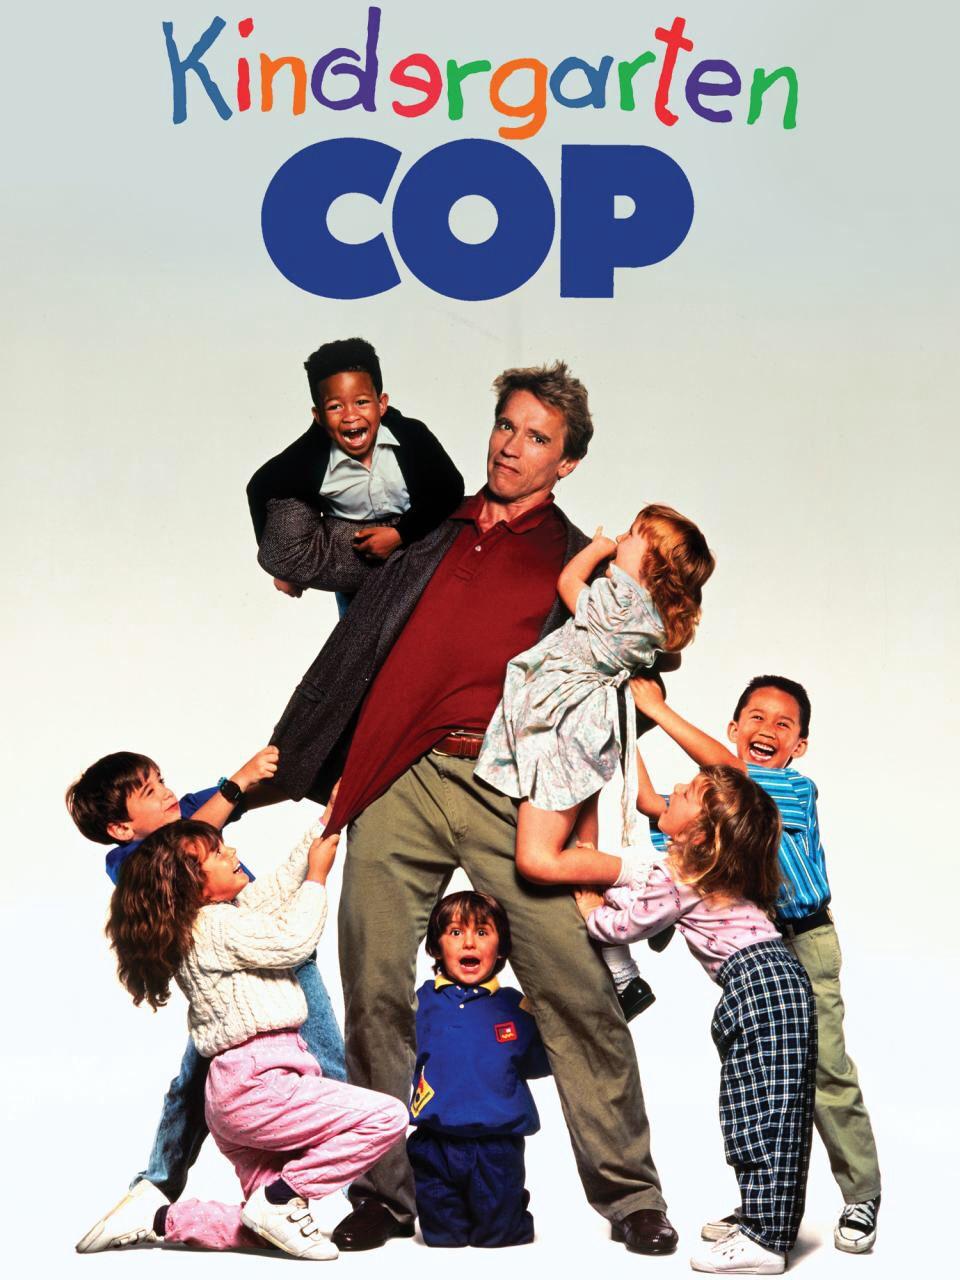 Kindergarten Cop Full Movies Online Free Streaming Movies Free